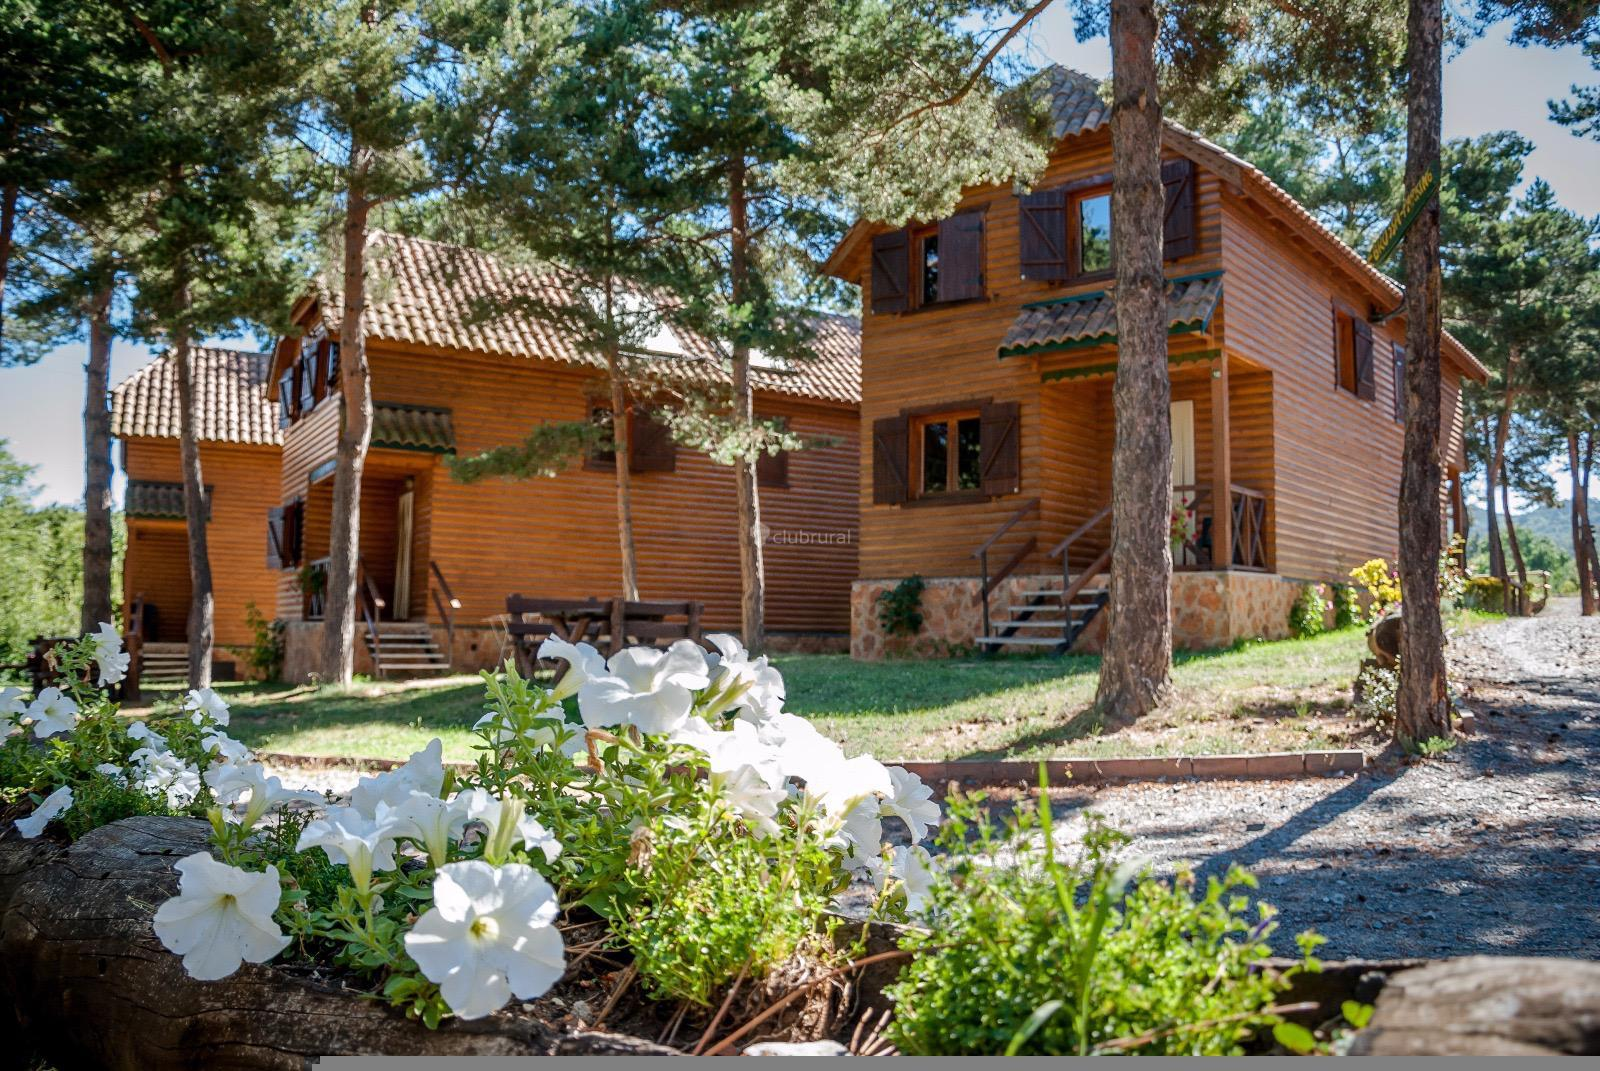 Fotos de xalet de prades tarragona prades clubrural for Casa rural tarragona